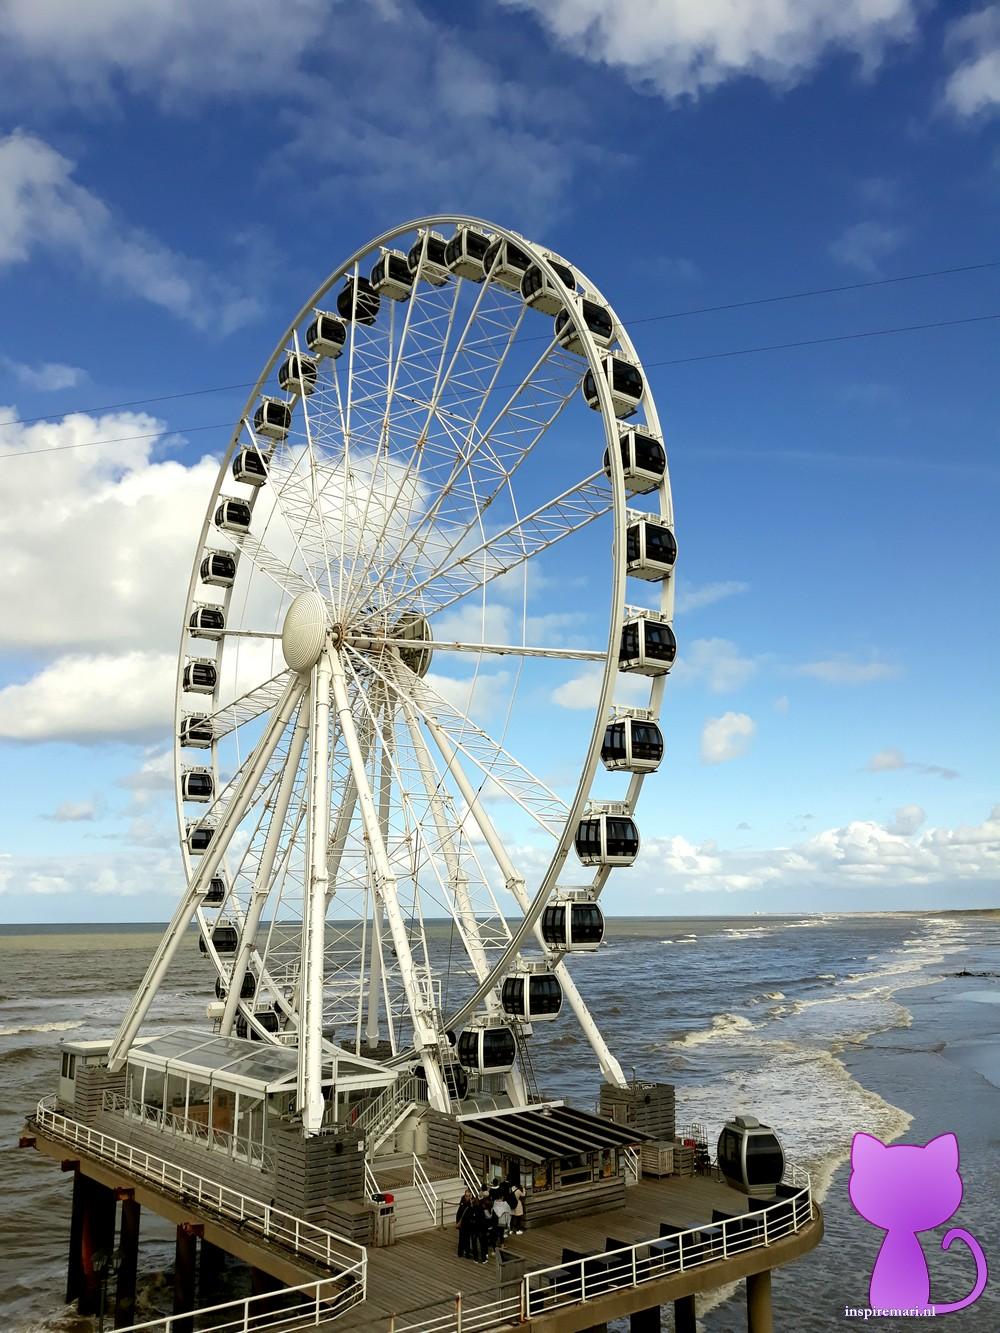 Ferris wheel of Scheveningen near The Hague, the Netherlands